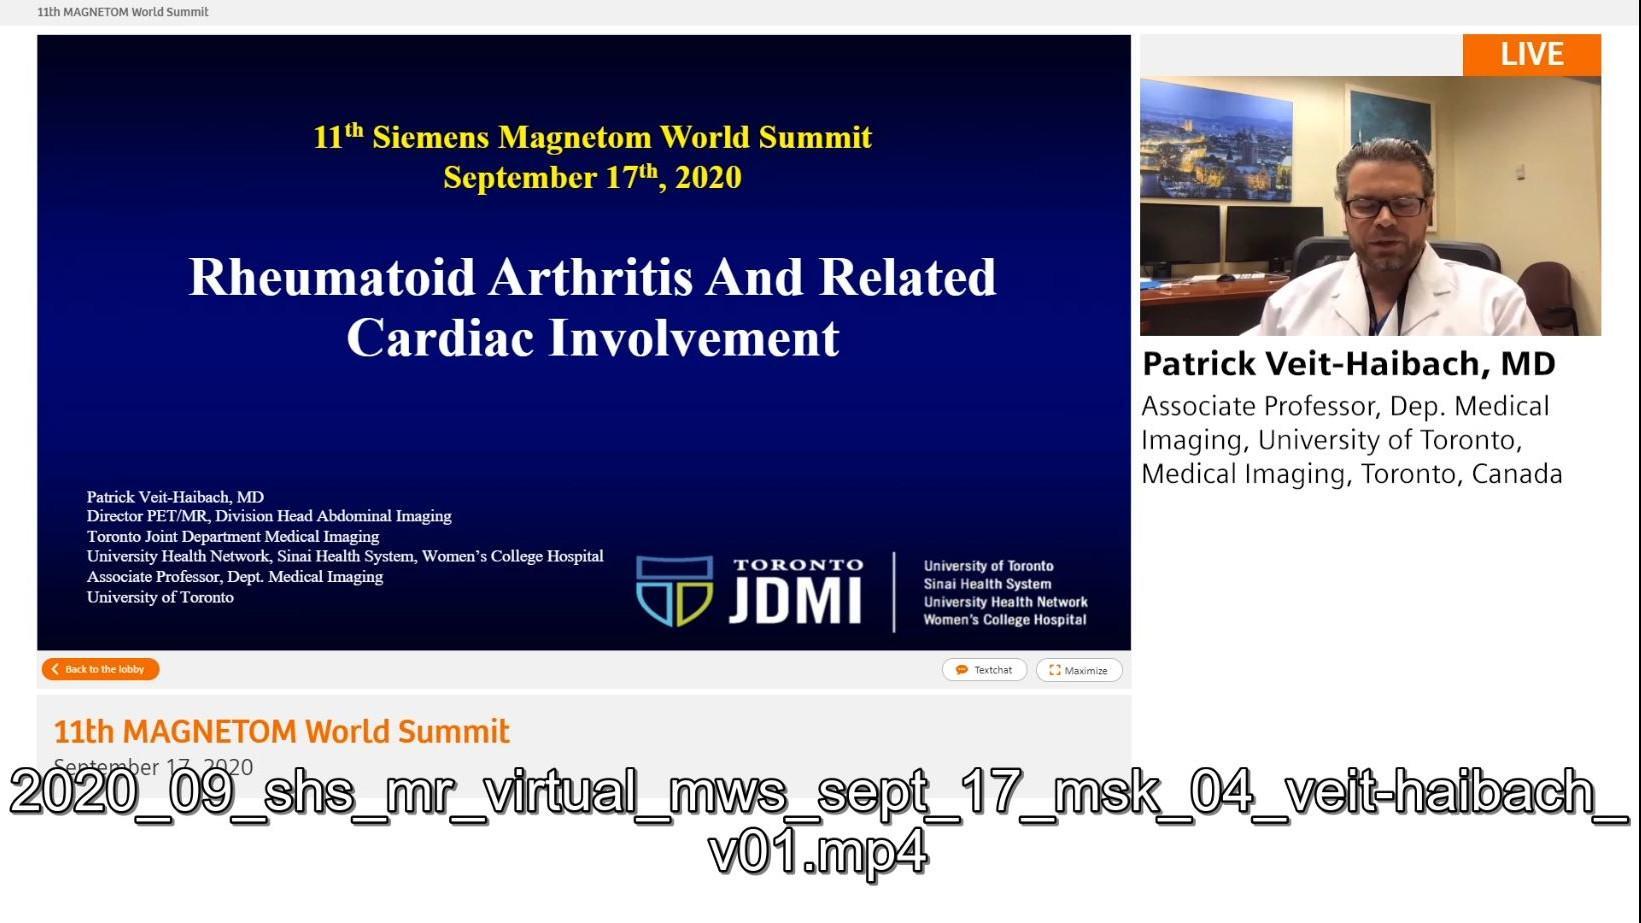 Preview Clinical Talk Patrick Veit-Haibach